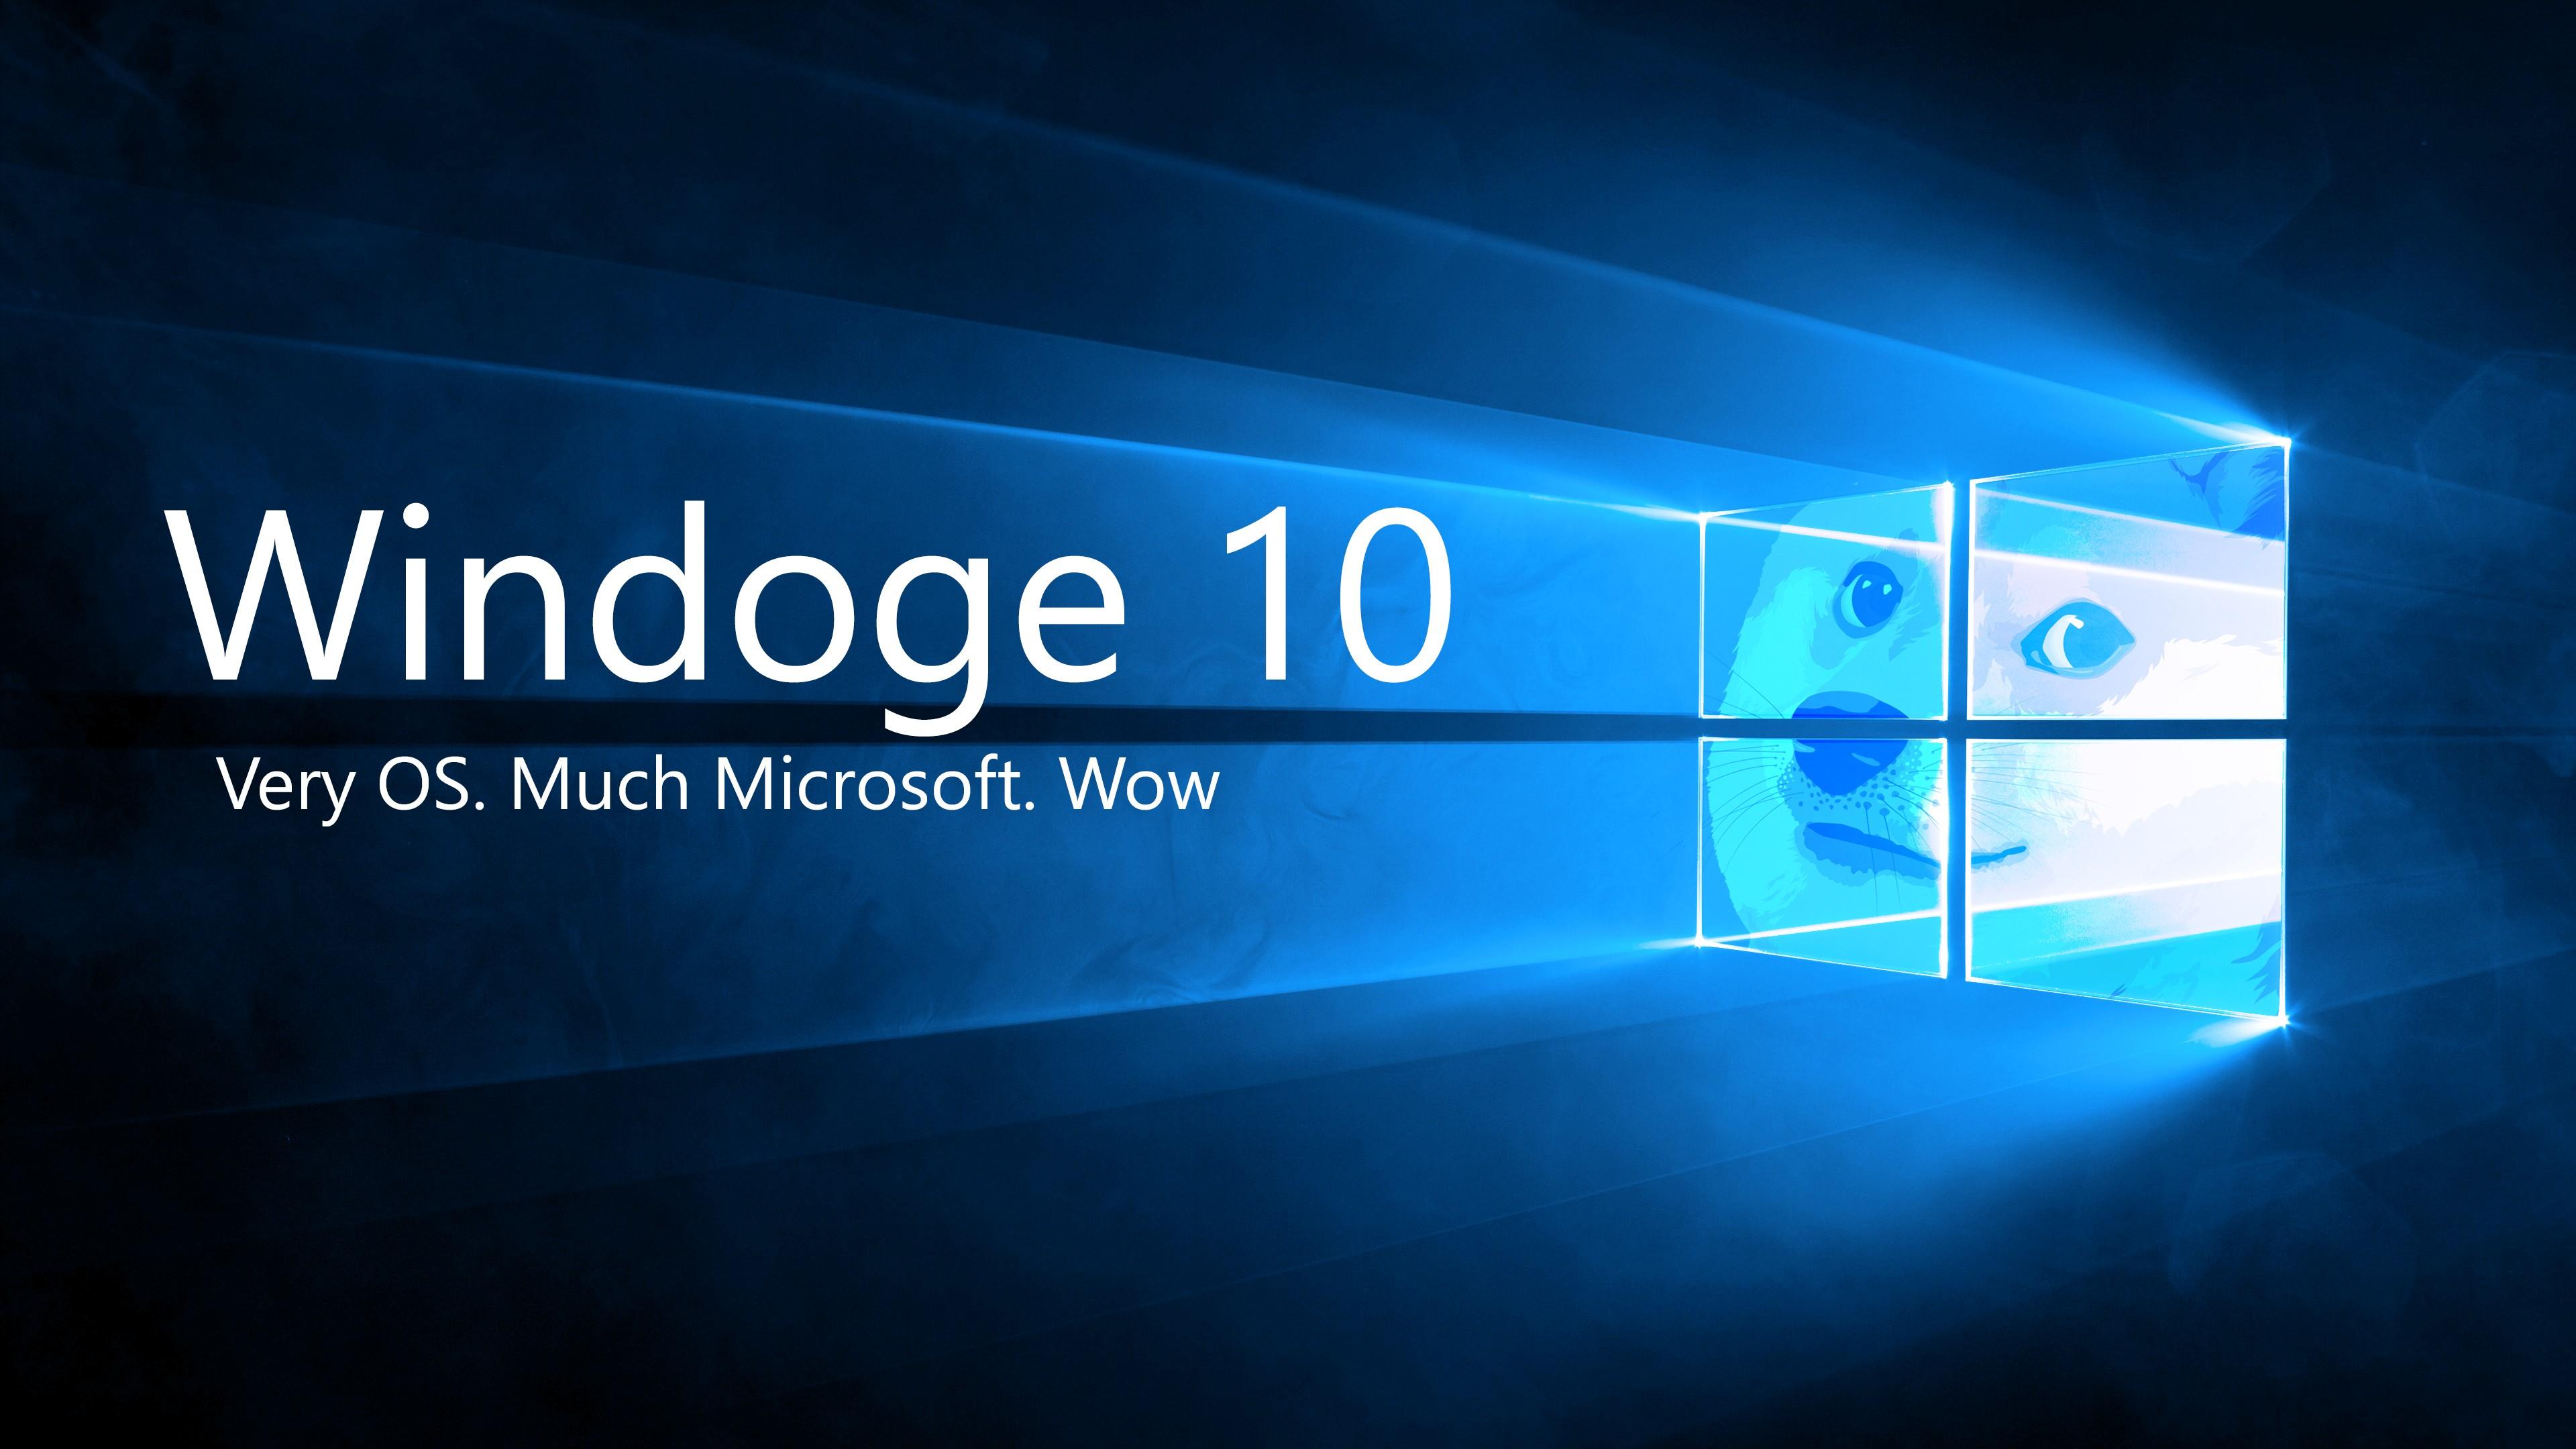 4k Resolution 4k Car Wallpaper Doge Microsoft Windows Shiba Inu Memes Wallpapers Hd